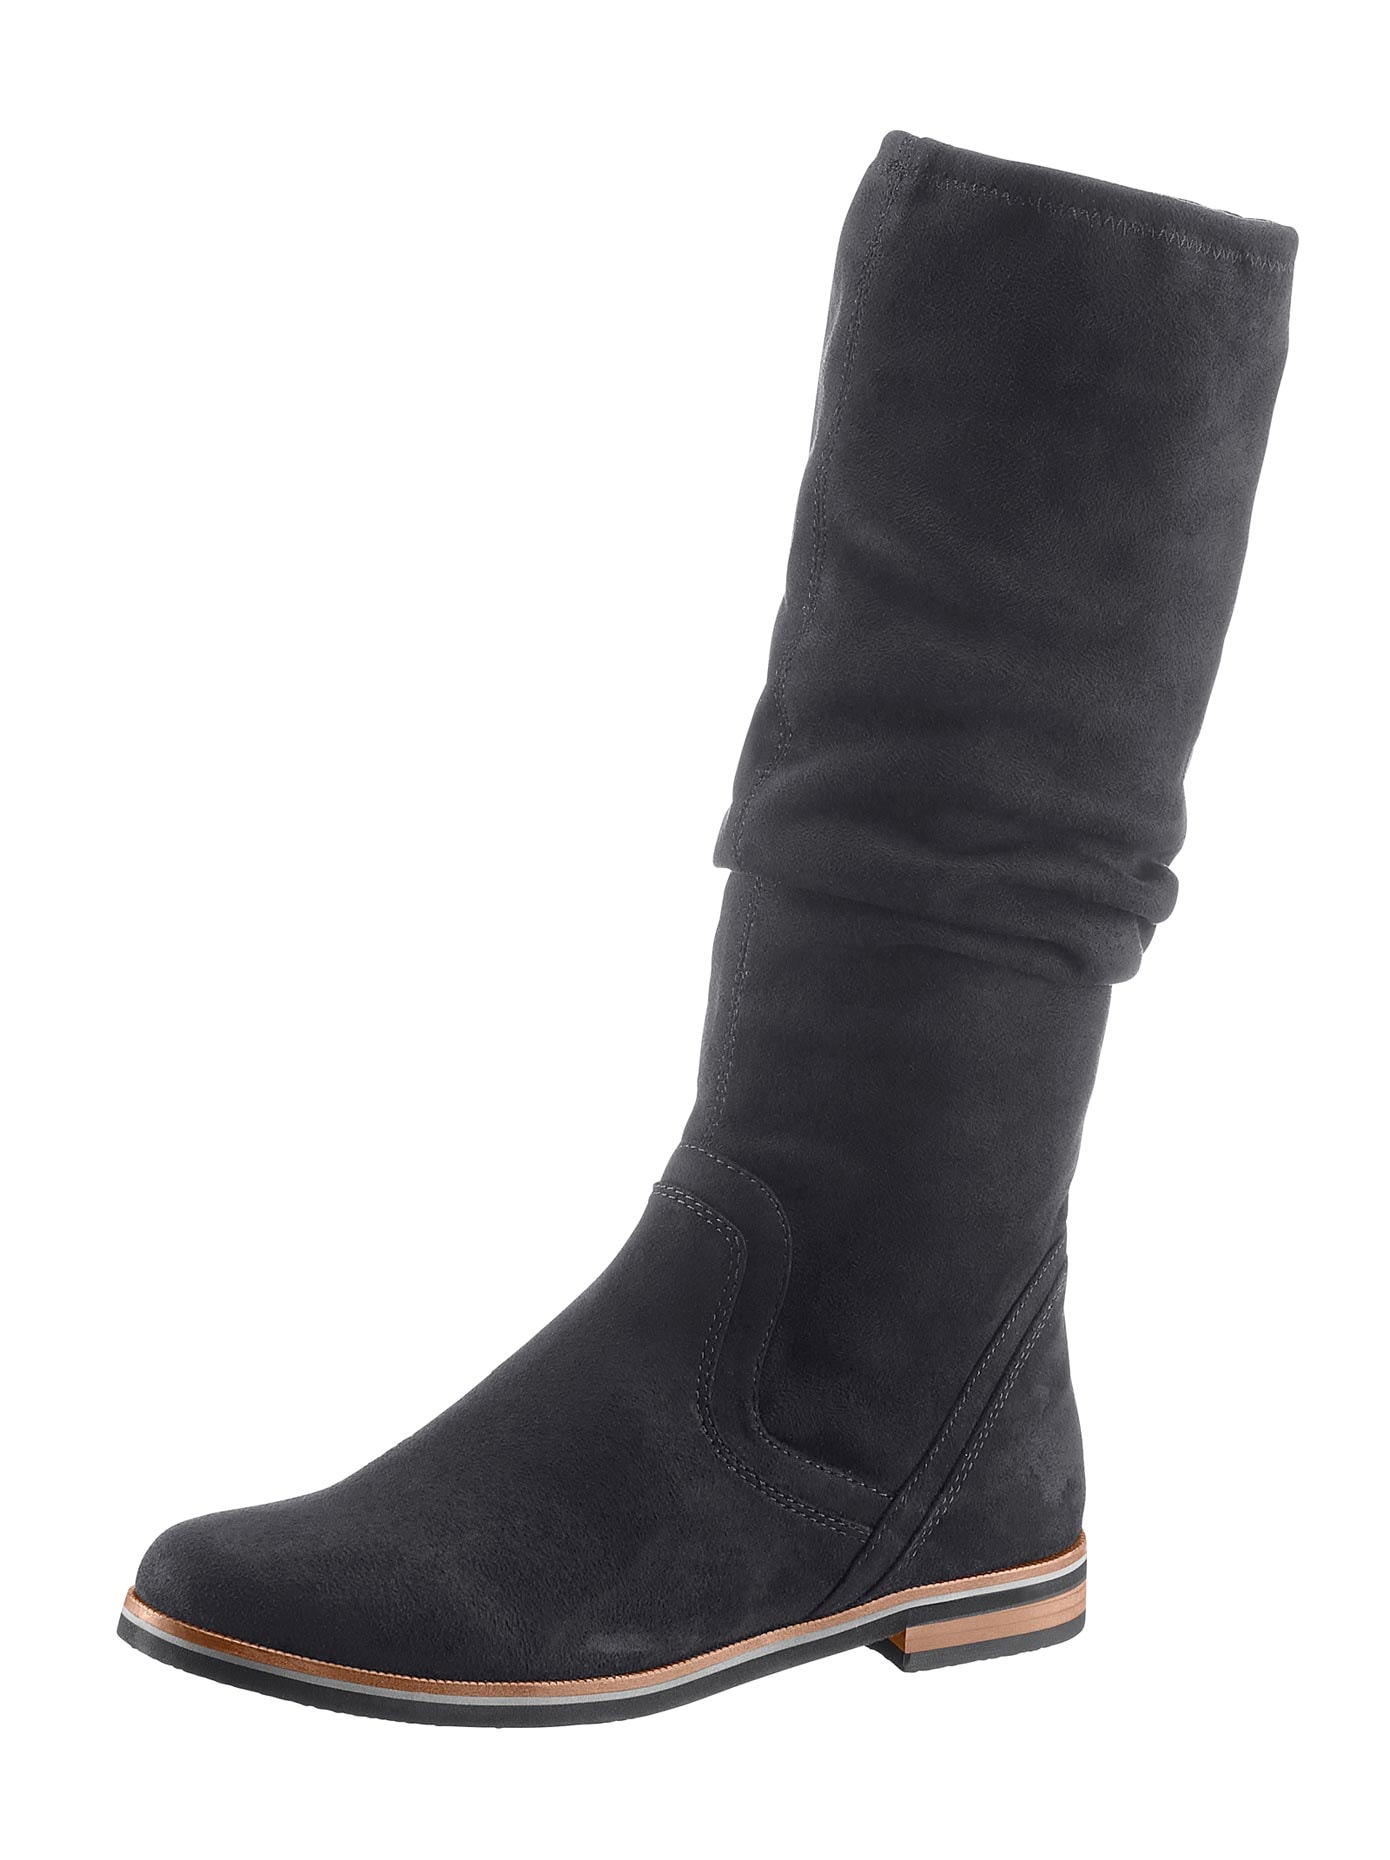 Caprice Stiefel   Luxodo